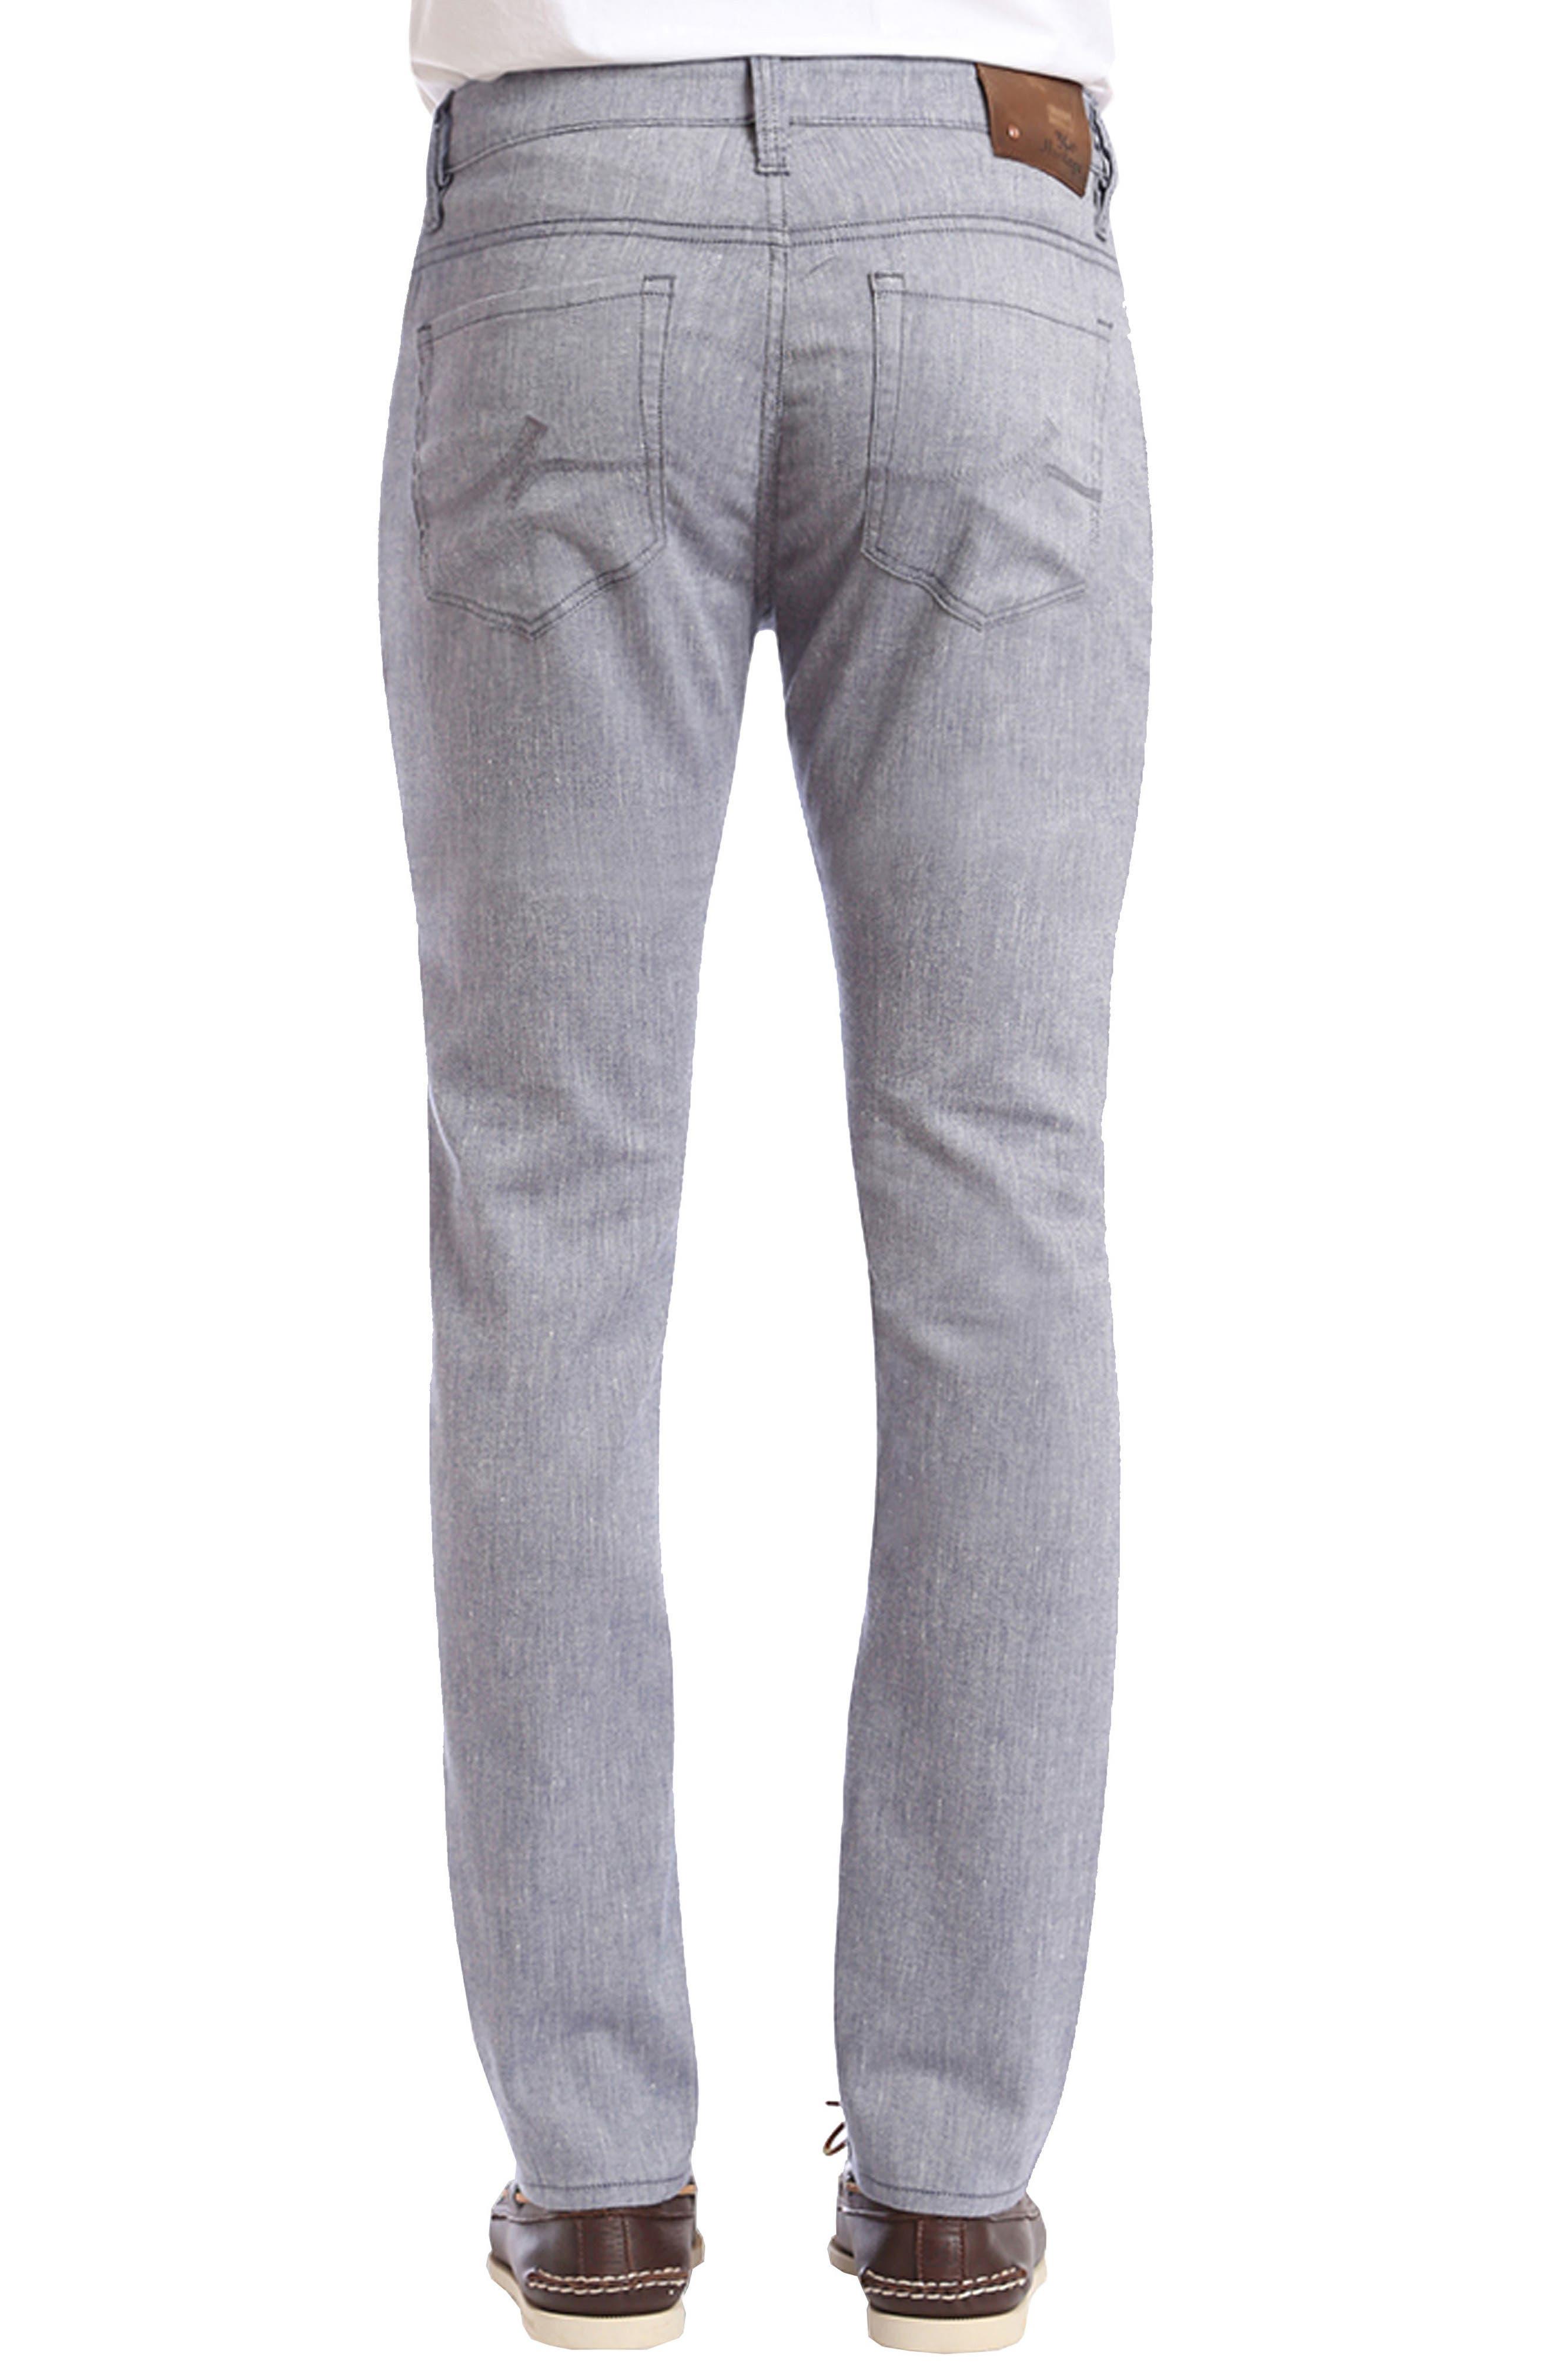 Courage Straight Leg Jeans,                             Alternate thumbnail 2, color,                             Indigo Textured